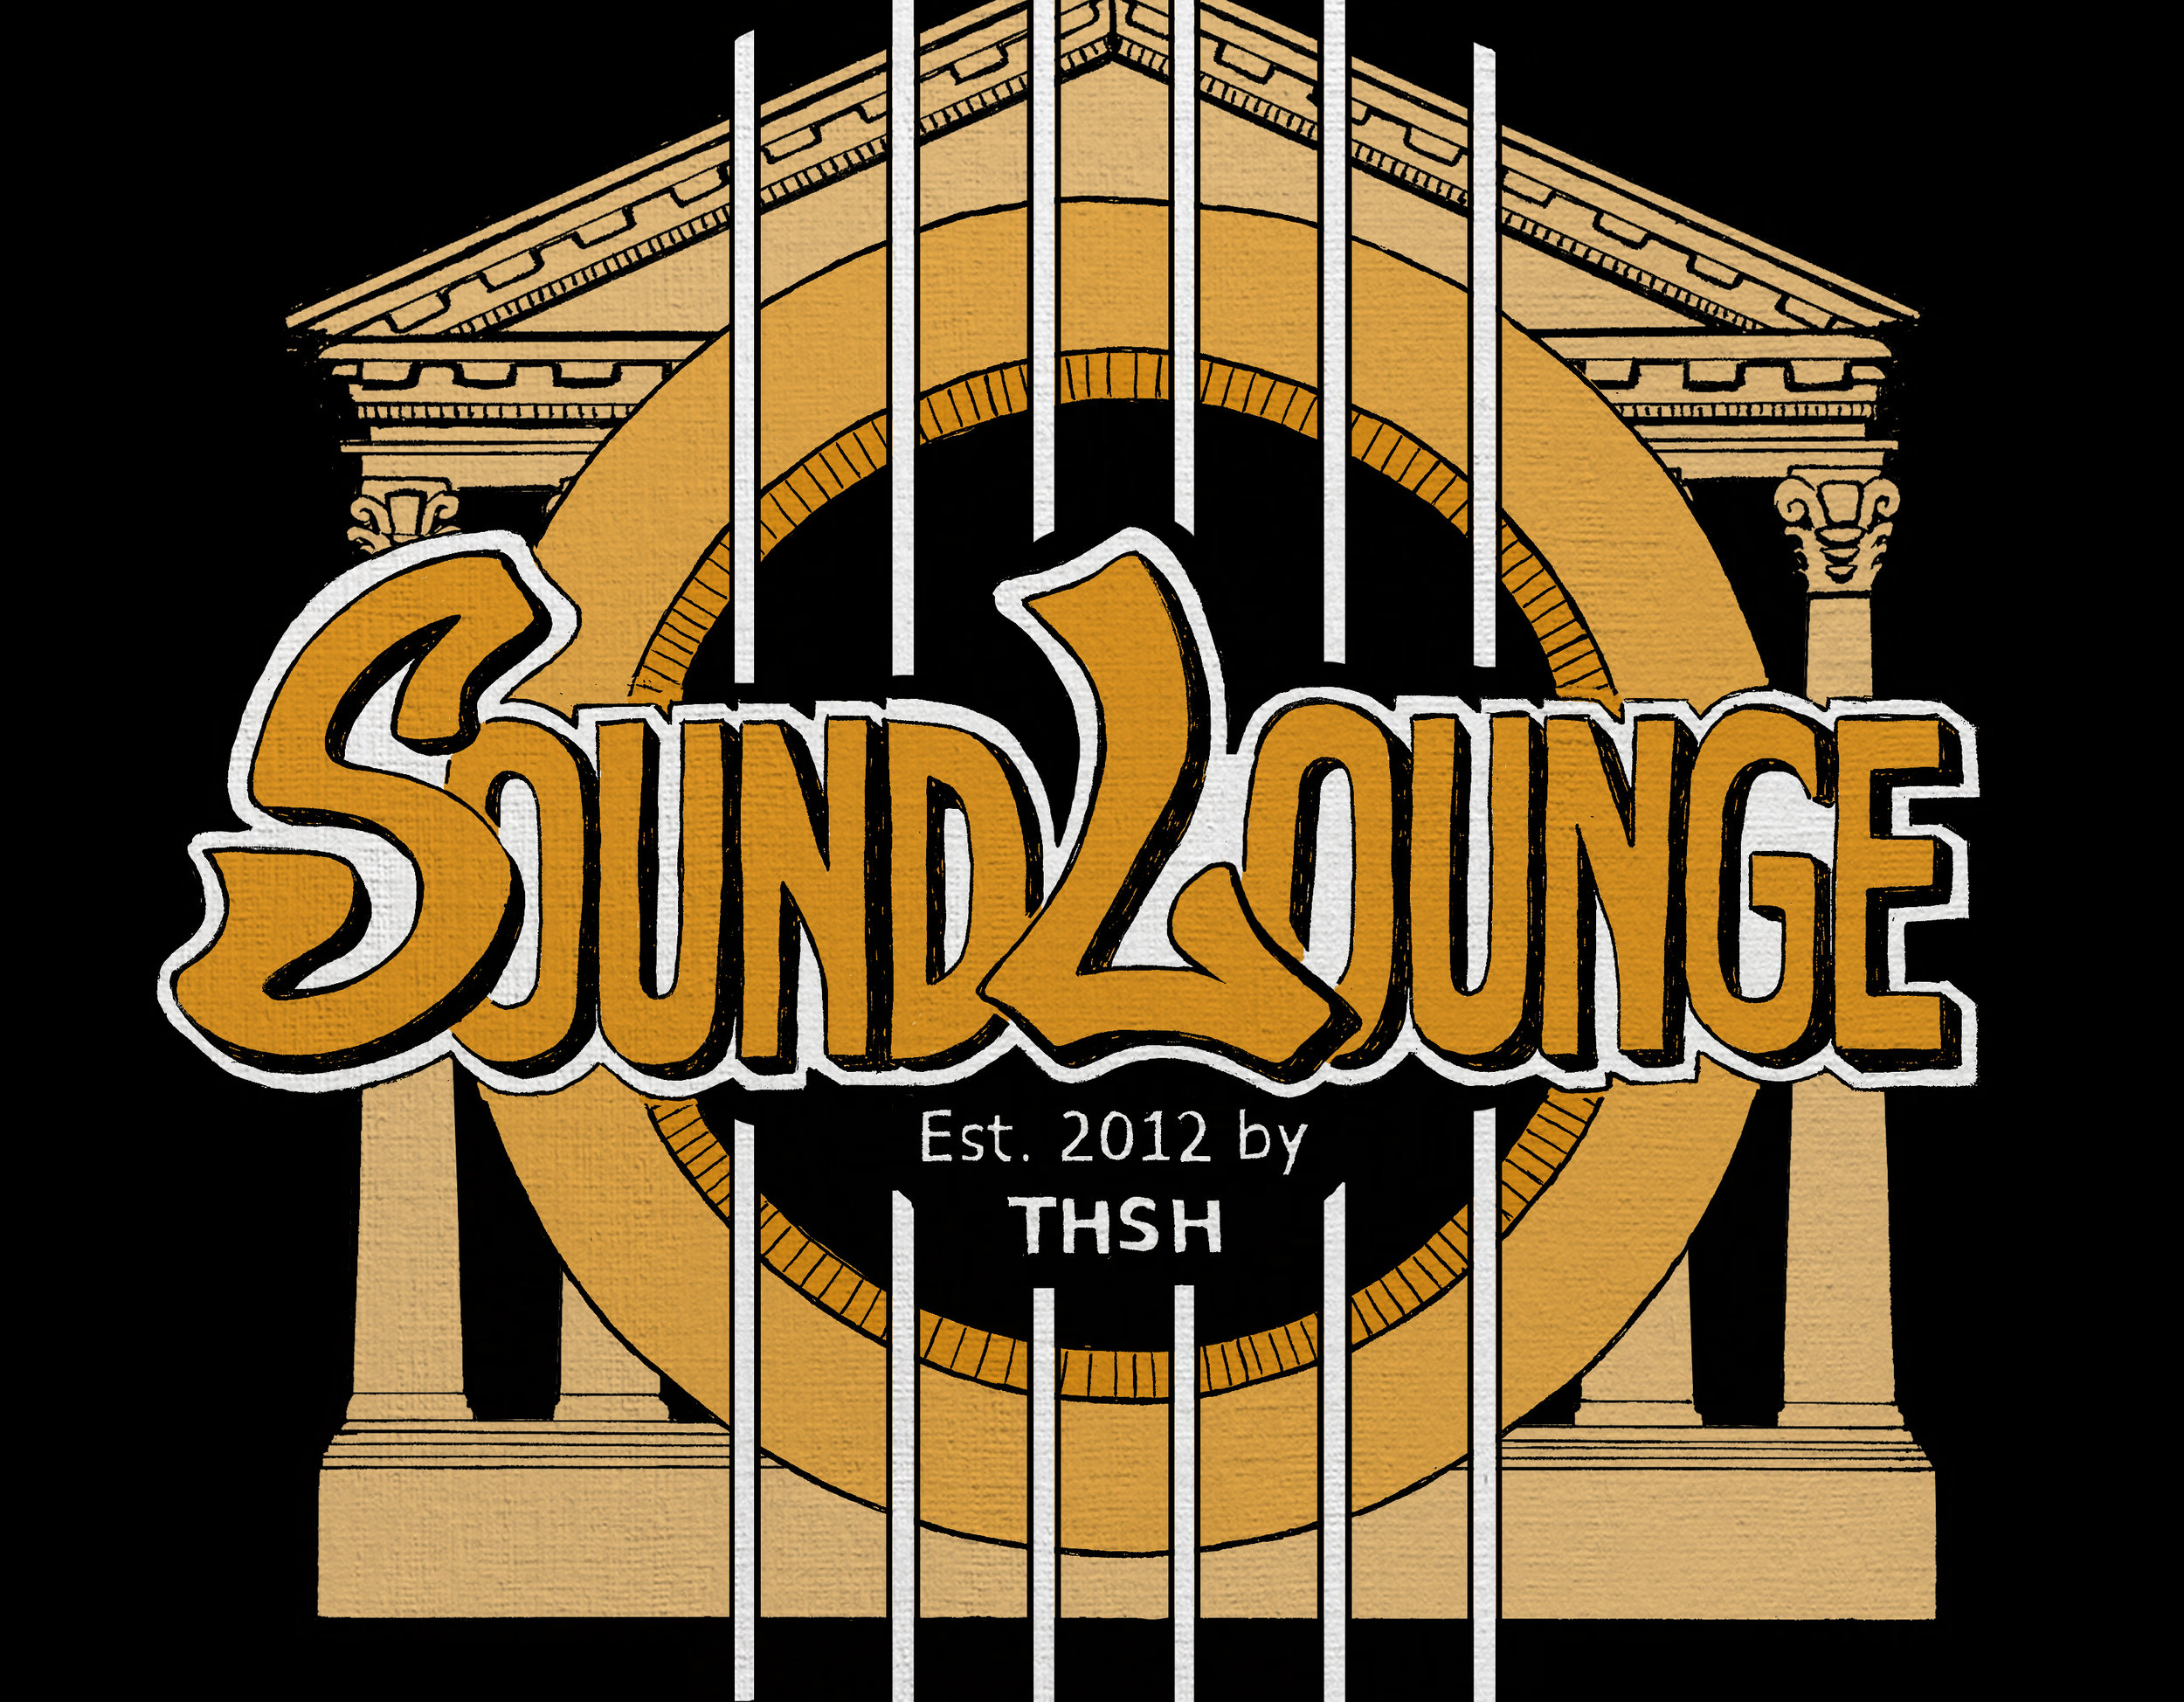 soundloungelogo1111.jpg